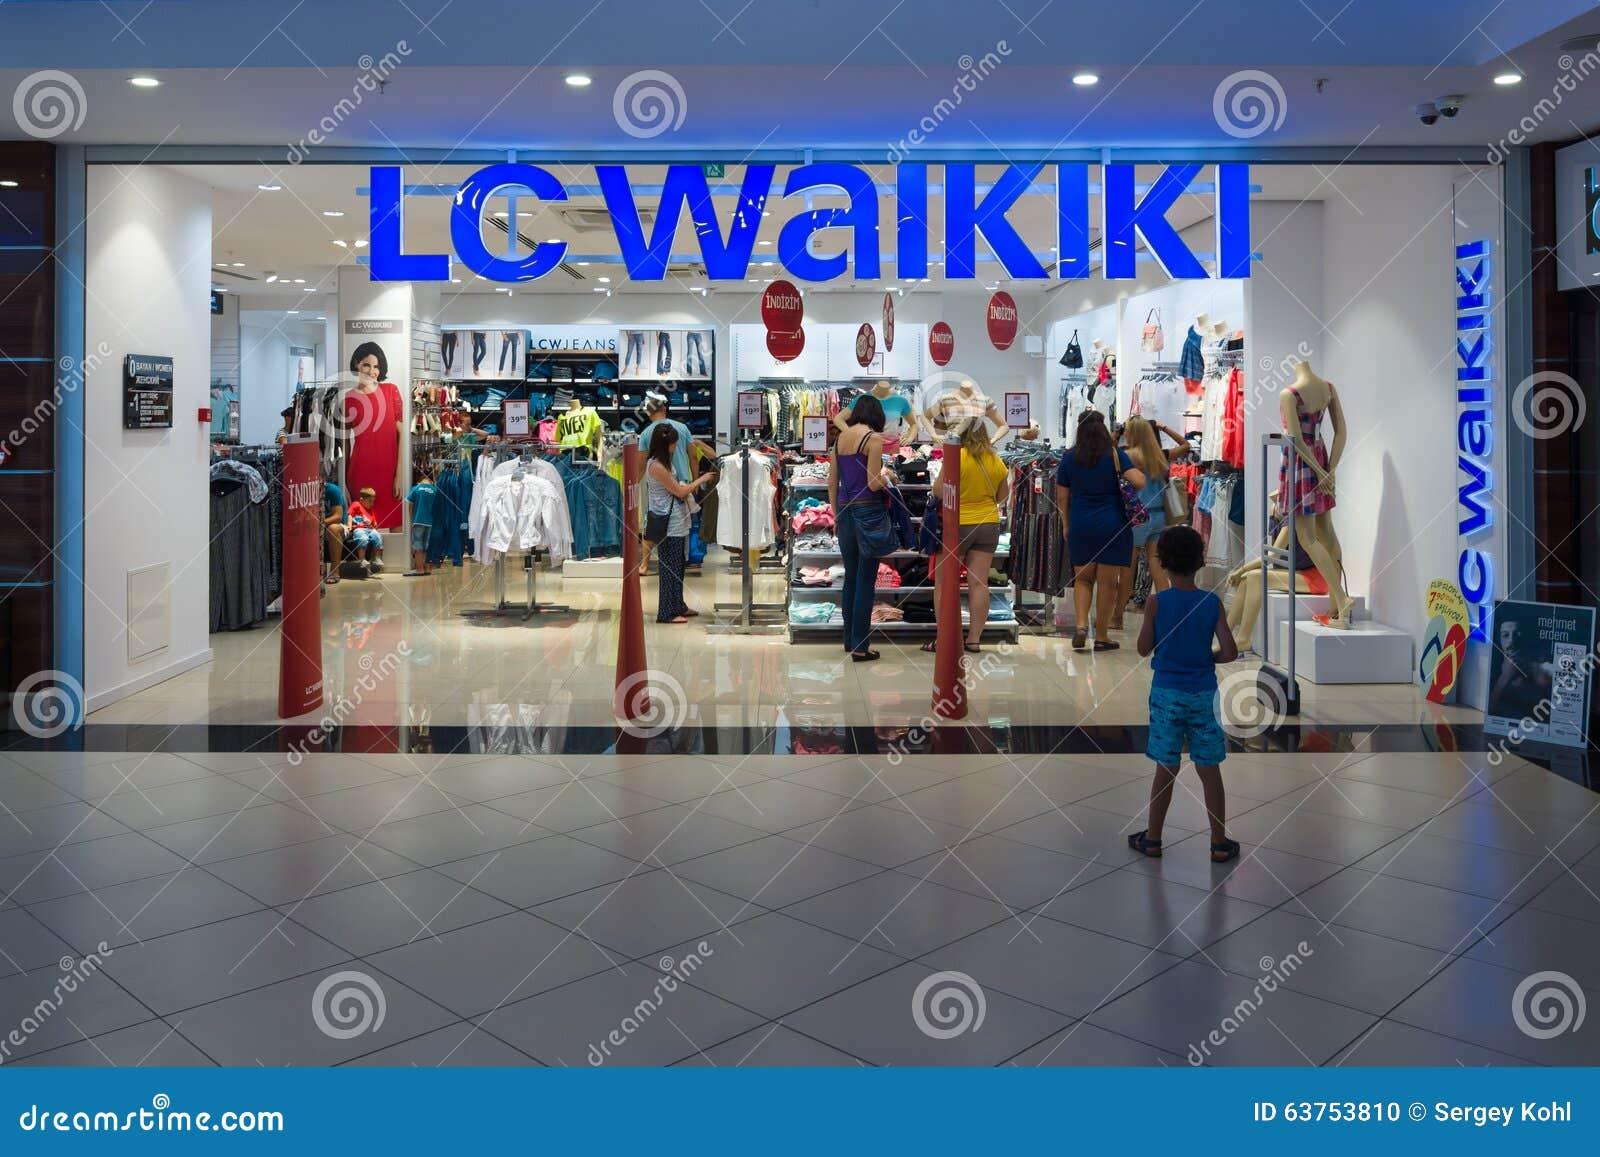 the shop lc waikiki editorial image image 63753810. Black Bedroom Furniture Sets. Home Design Ideas